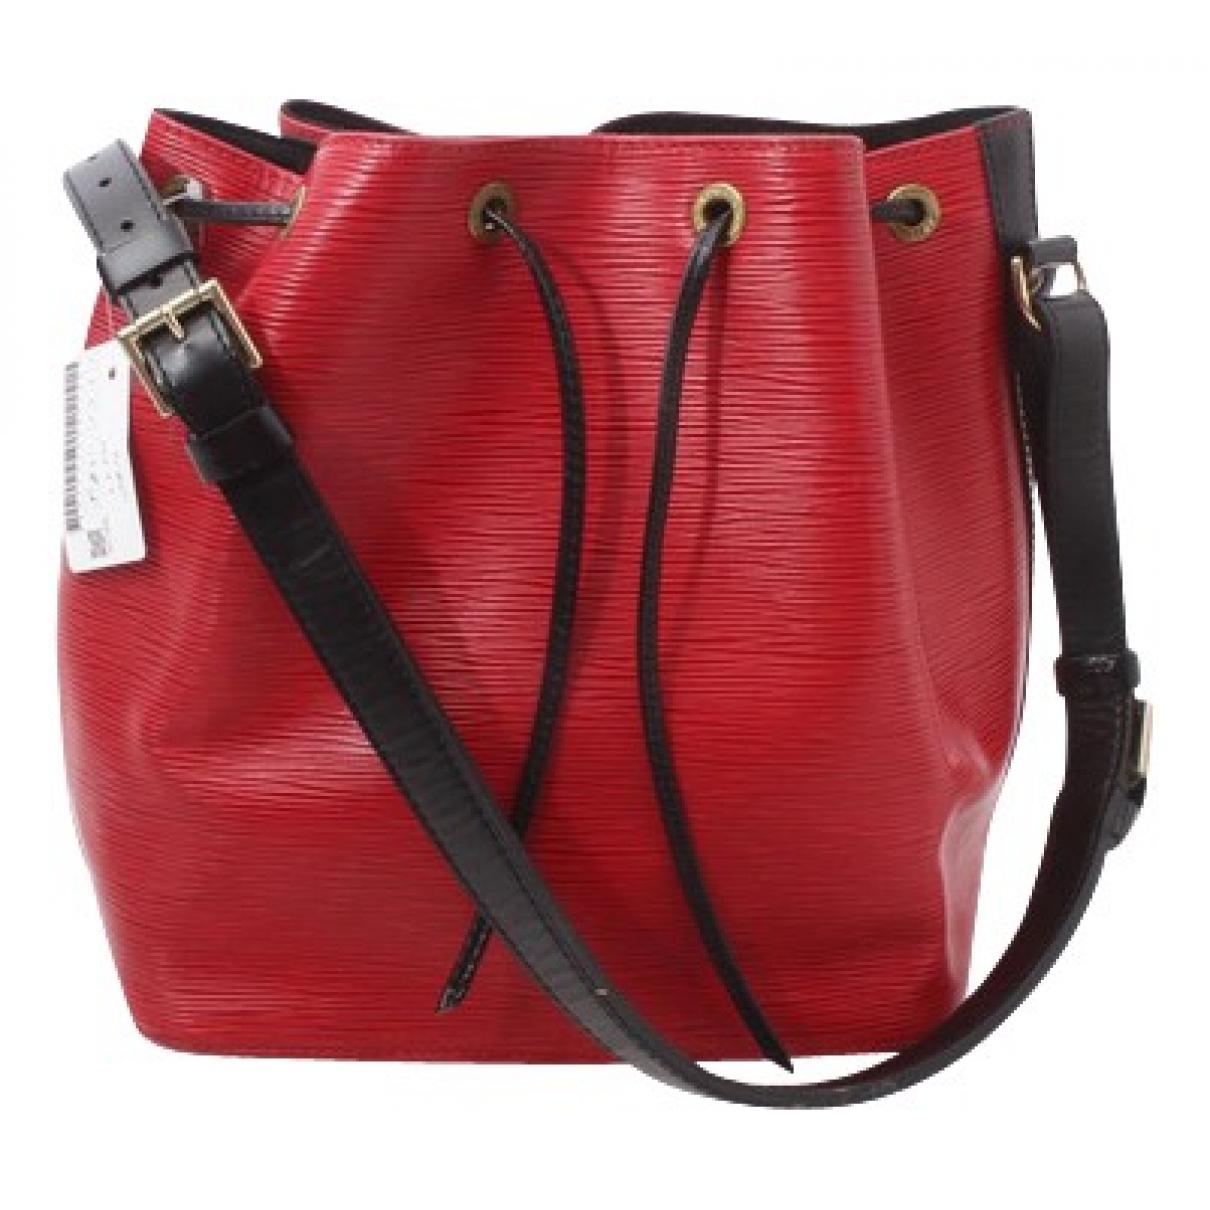 Louis Vuitton Noé Red Leather handbag for Women \N